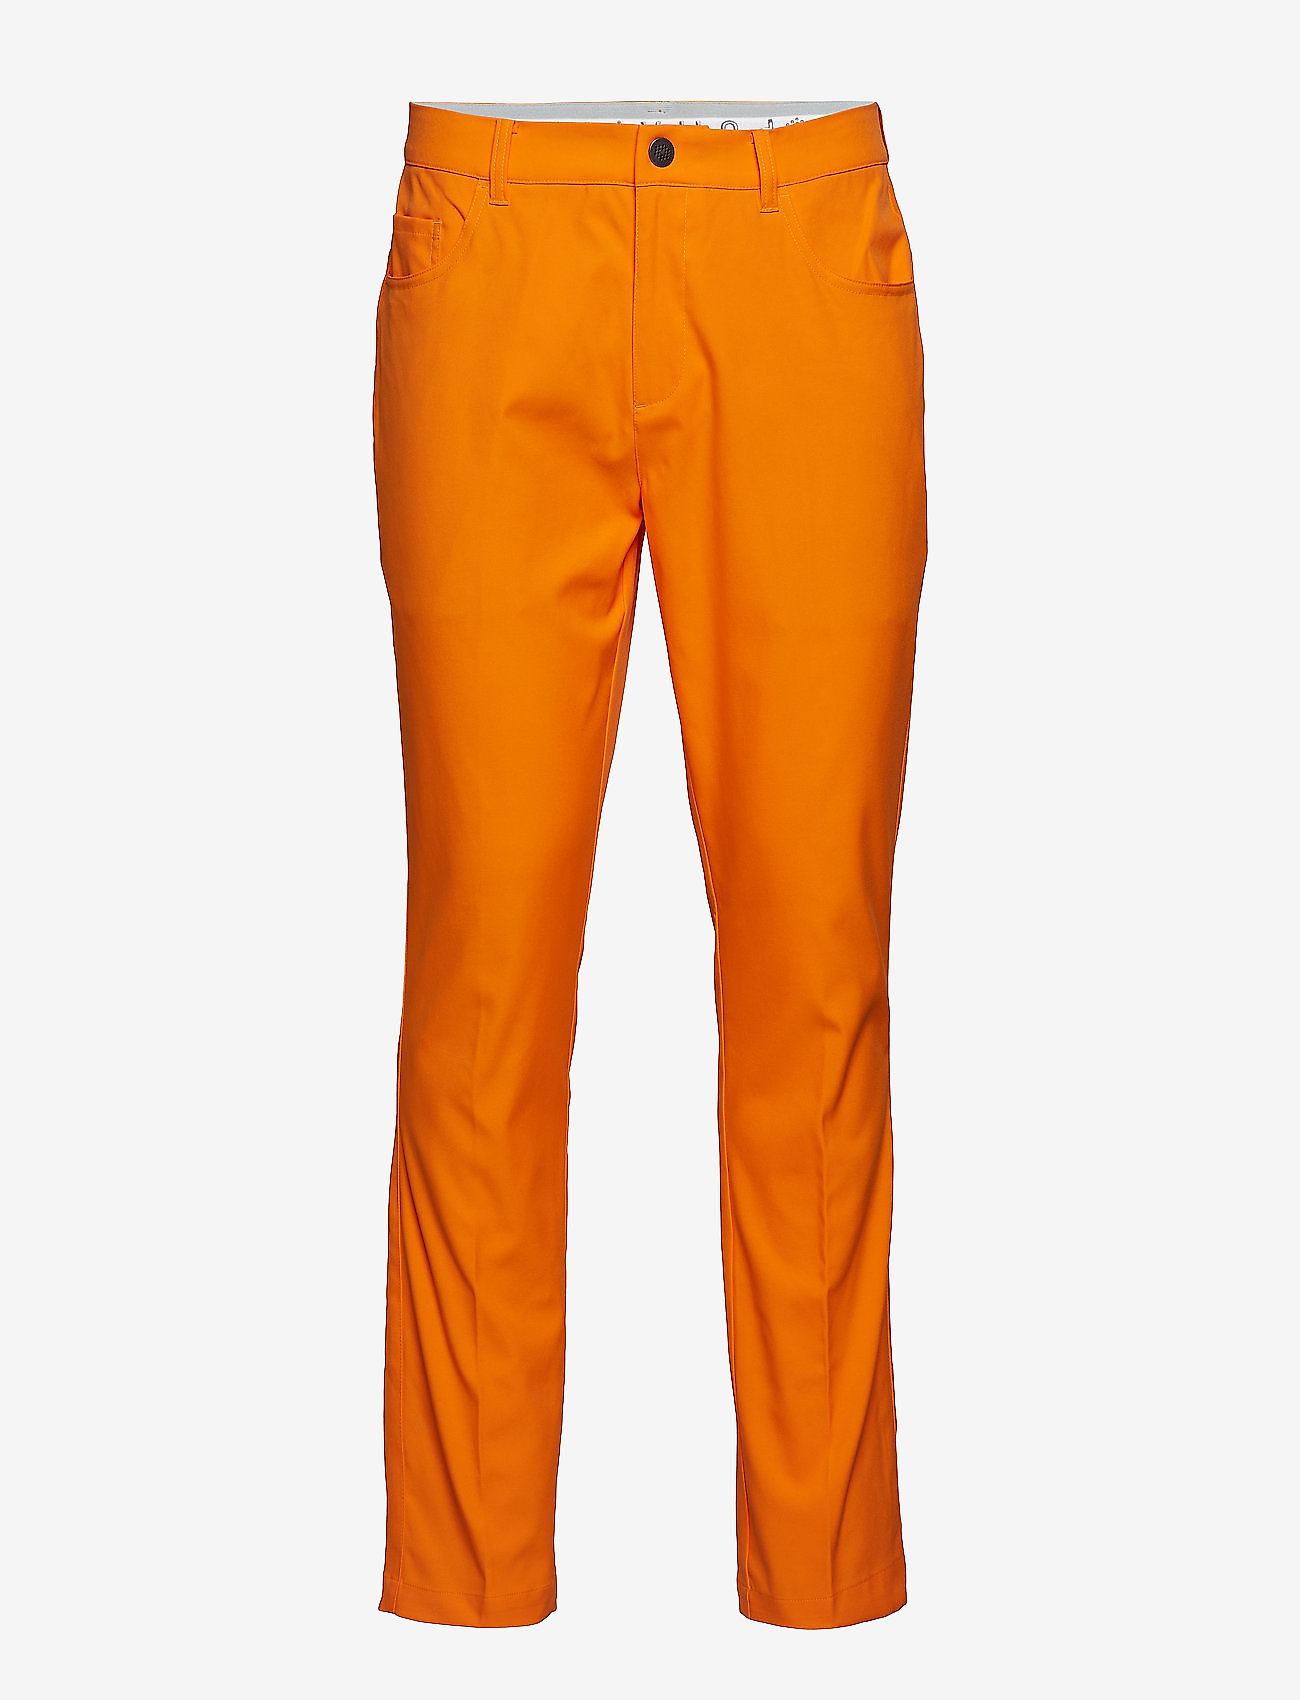 PUMA Golf - Jackpot 5 Pocket Pant - golfbukser - vibrant orange - 0